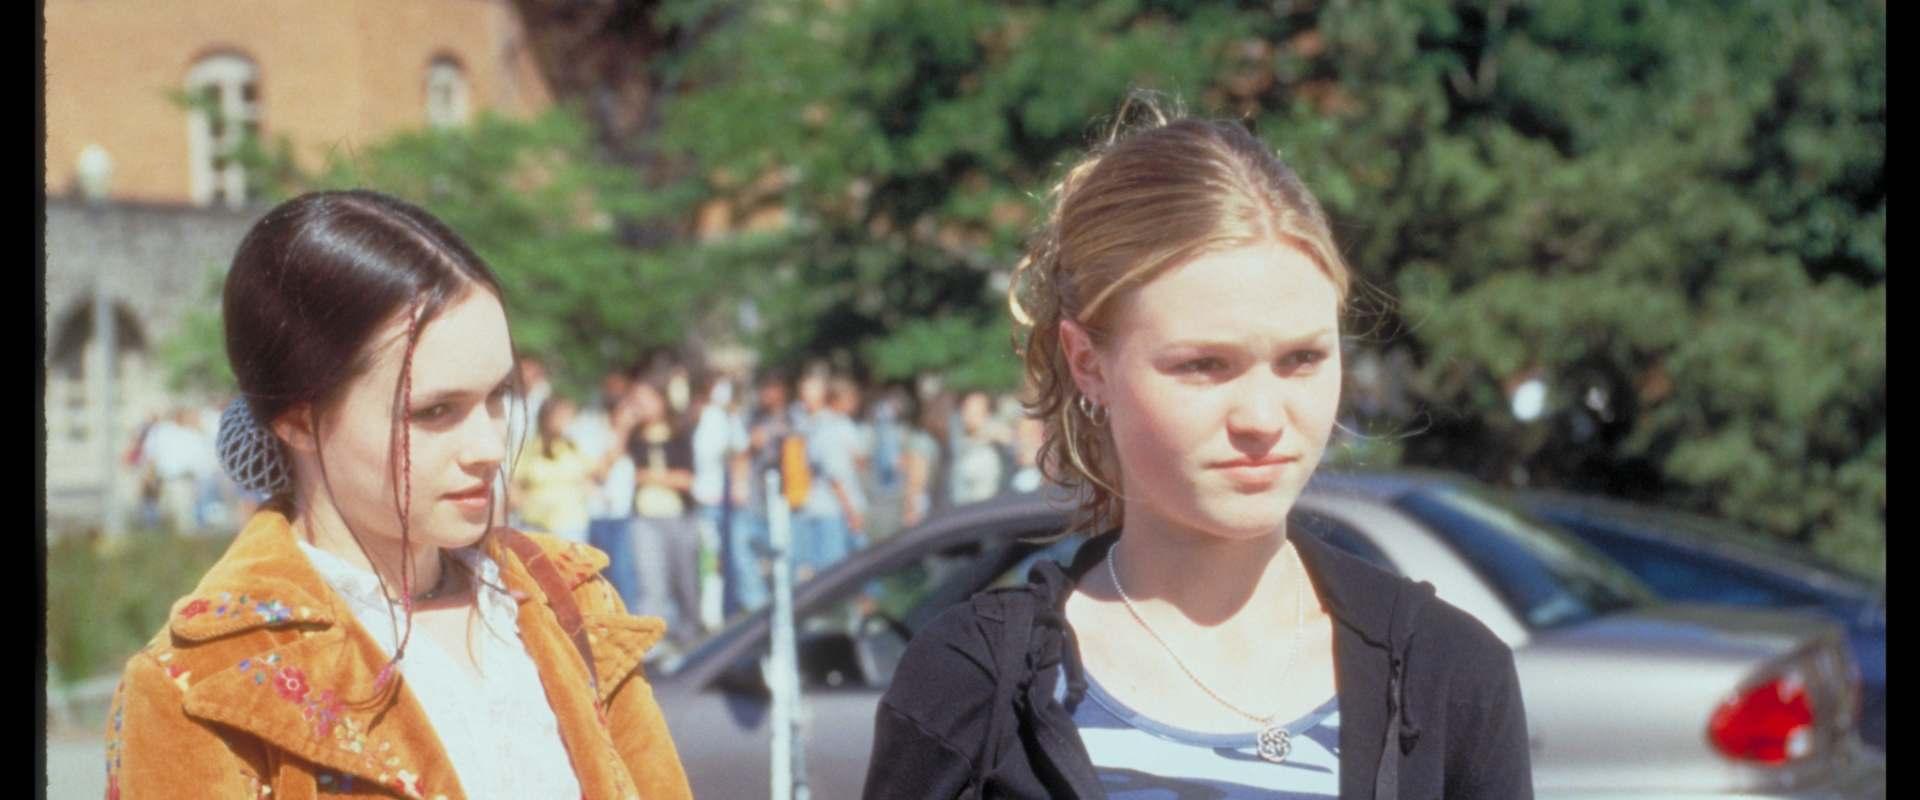 Genre Grandeur 10 Things I Hate About You 1999: Watch 10 Things I Hate About You On Netflix Today